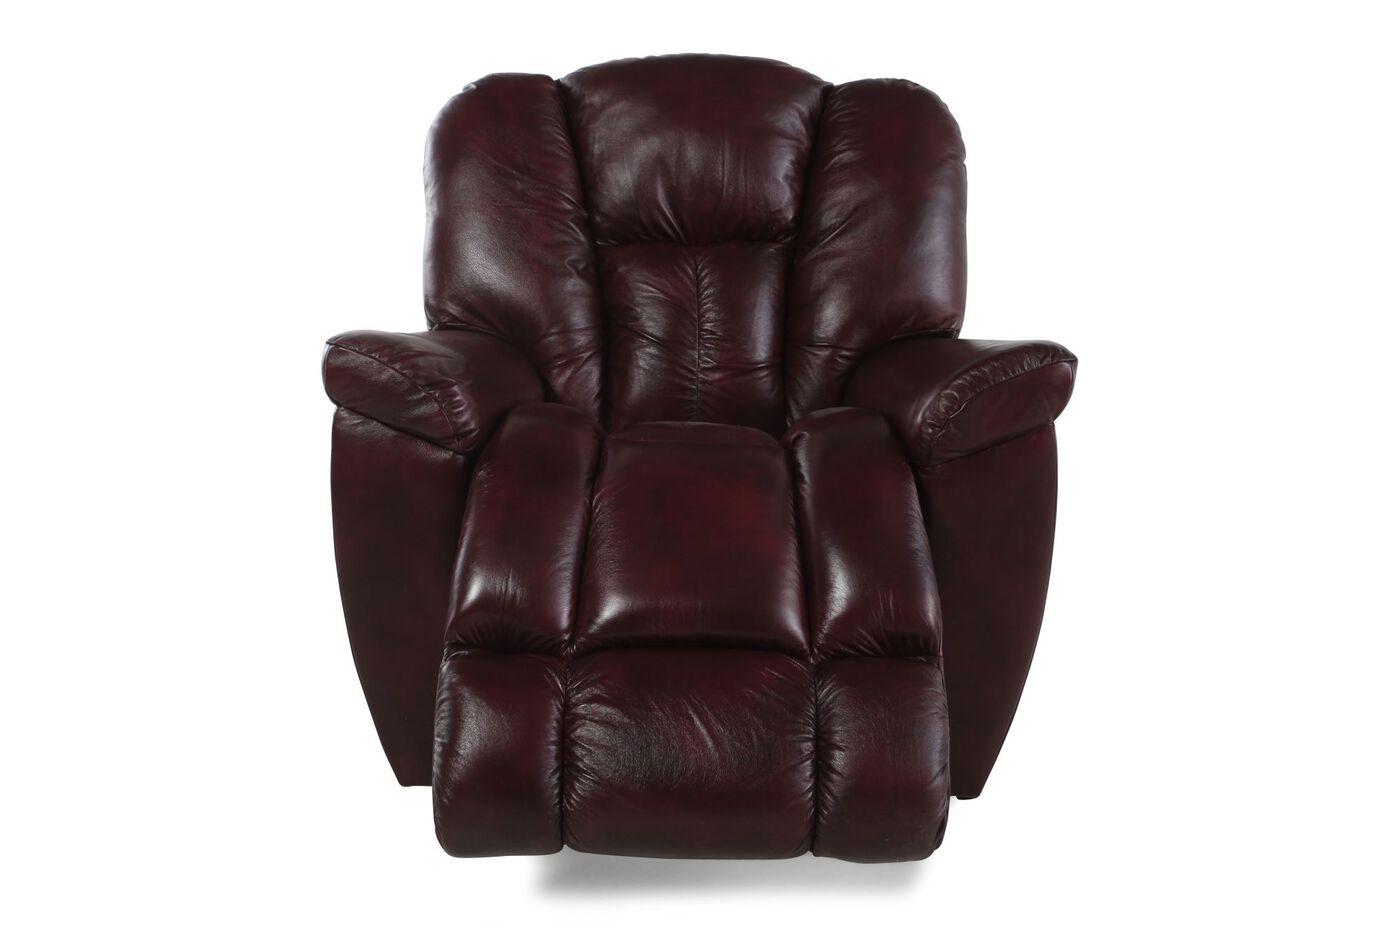 La Z Boy Maverick Claret Recliner Mathis Brothers Furniture